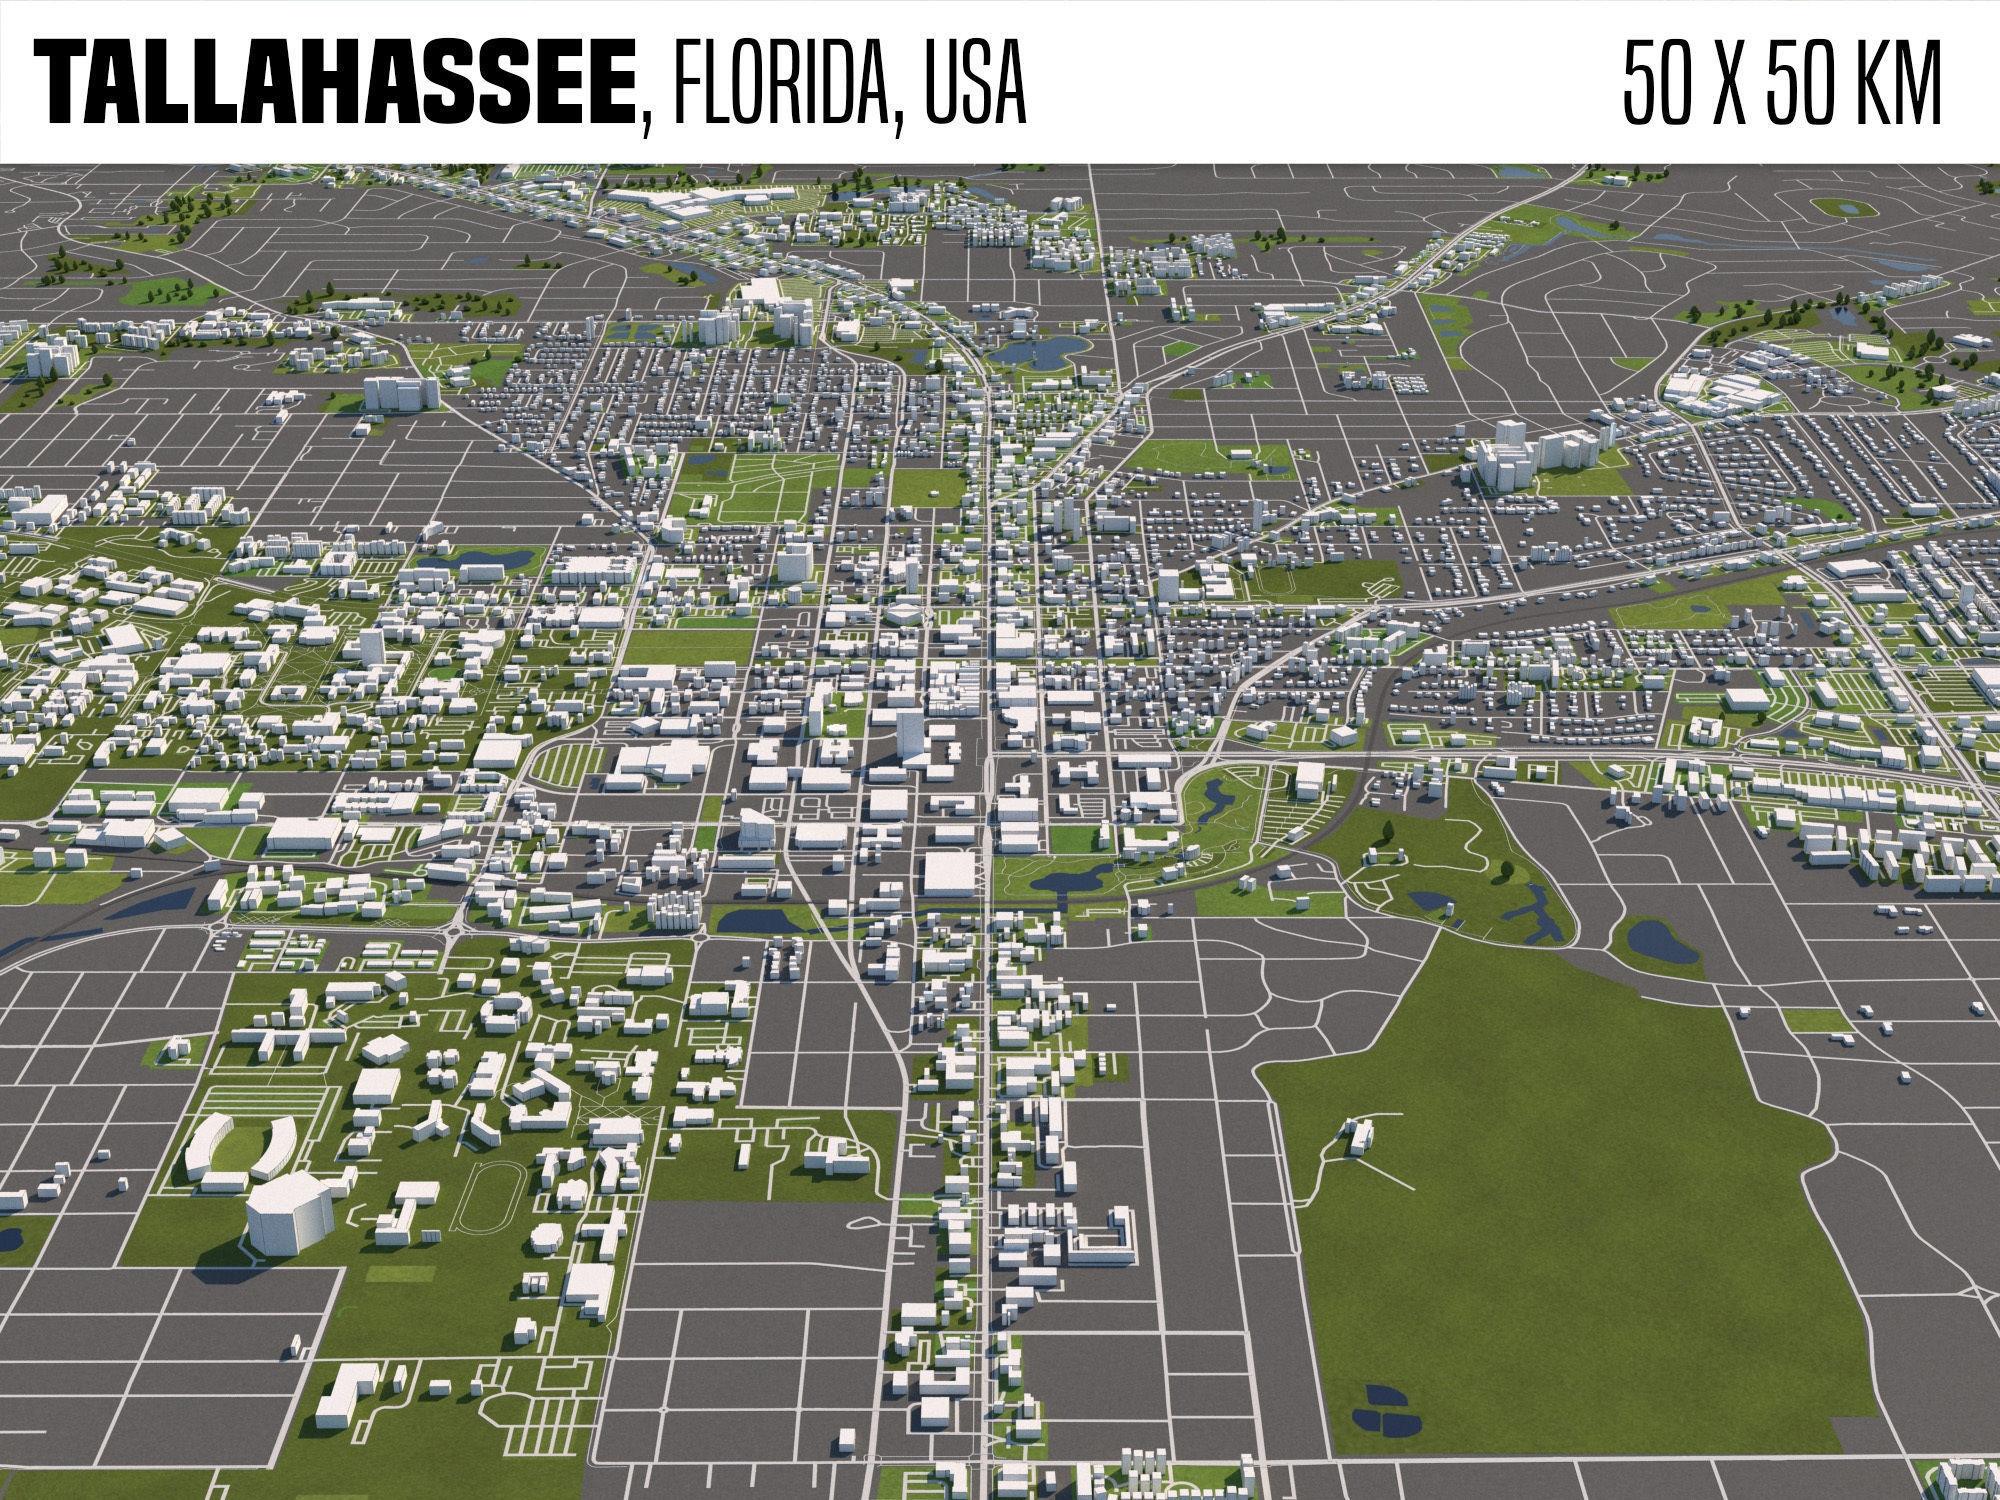 Tallahassee Florida USA 50x50km